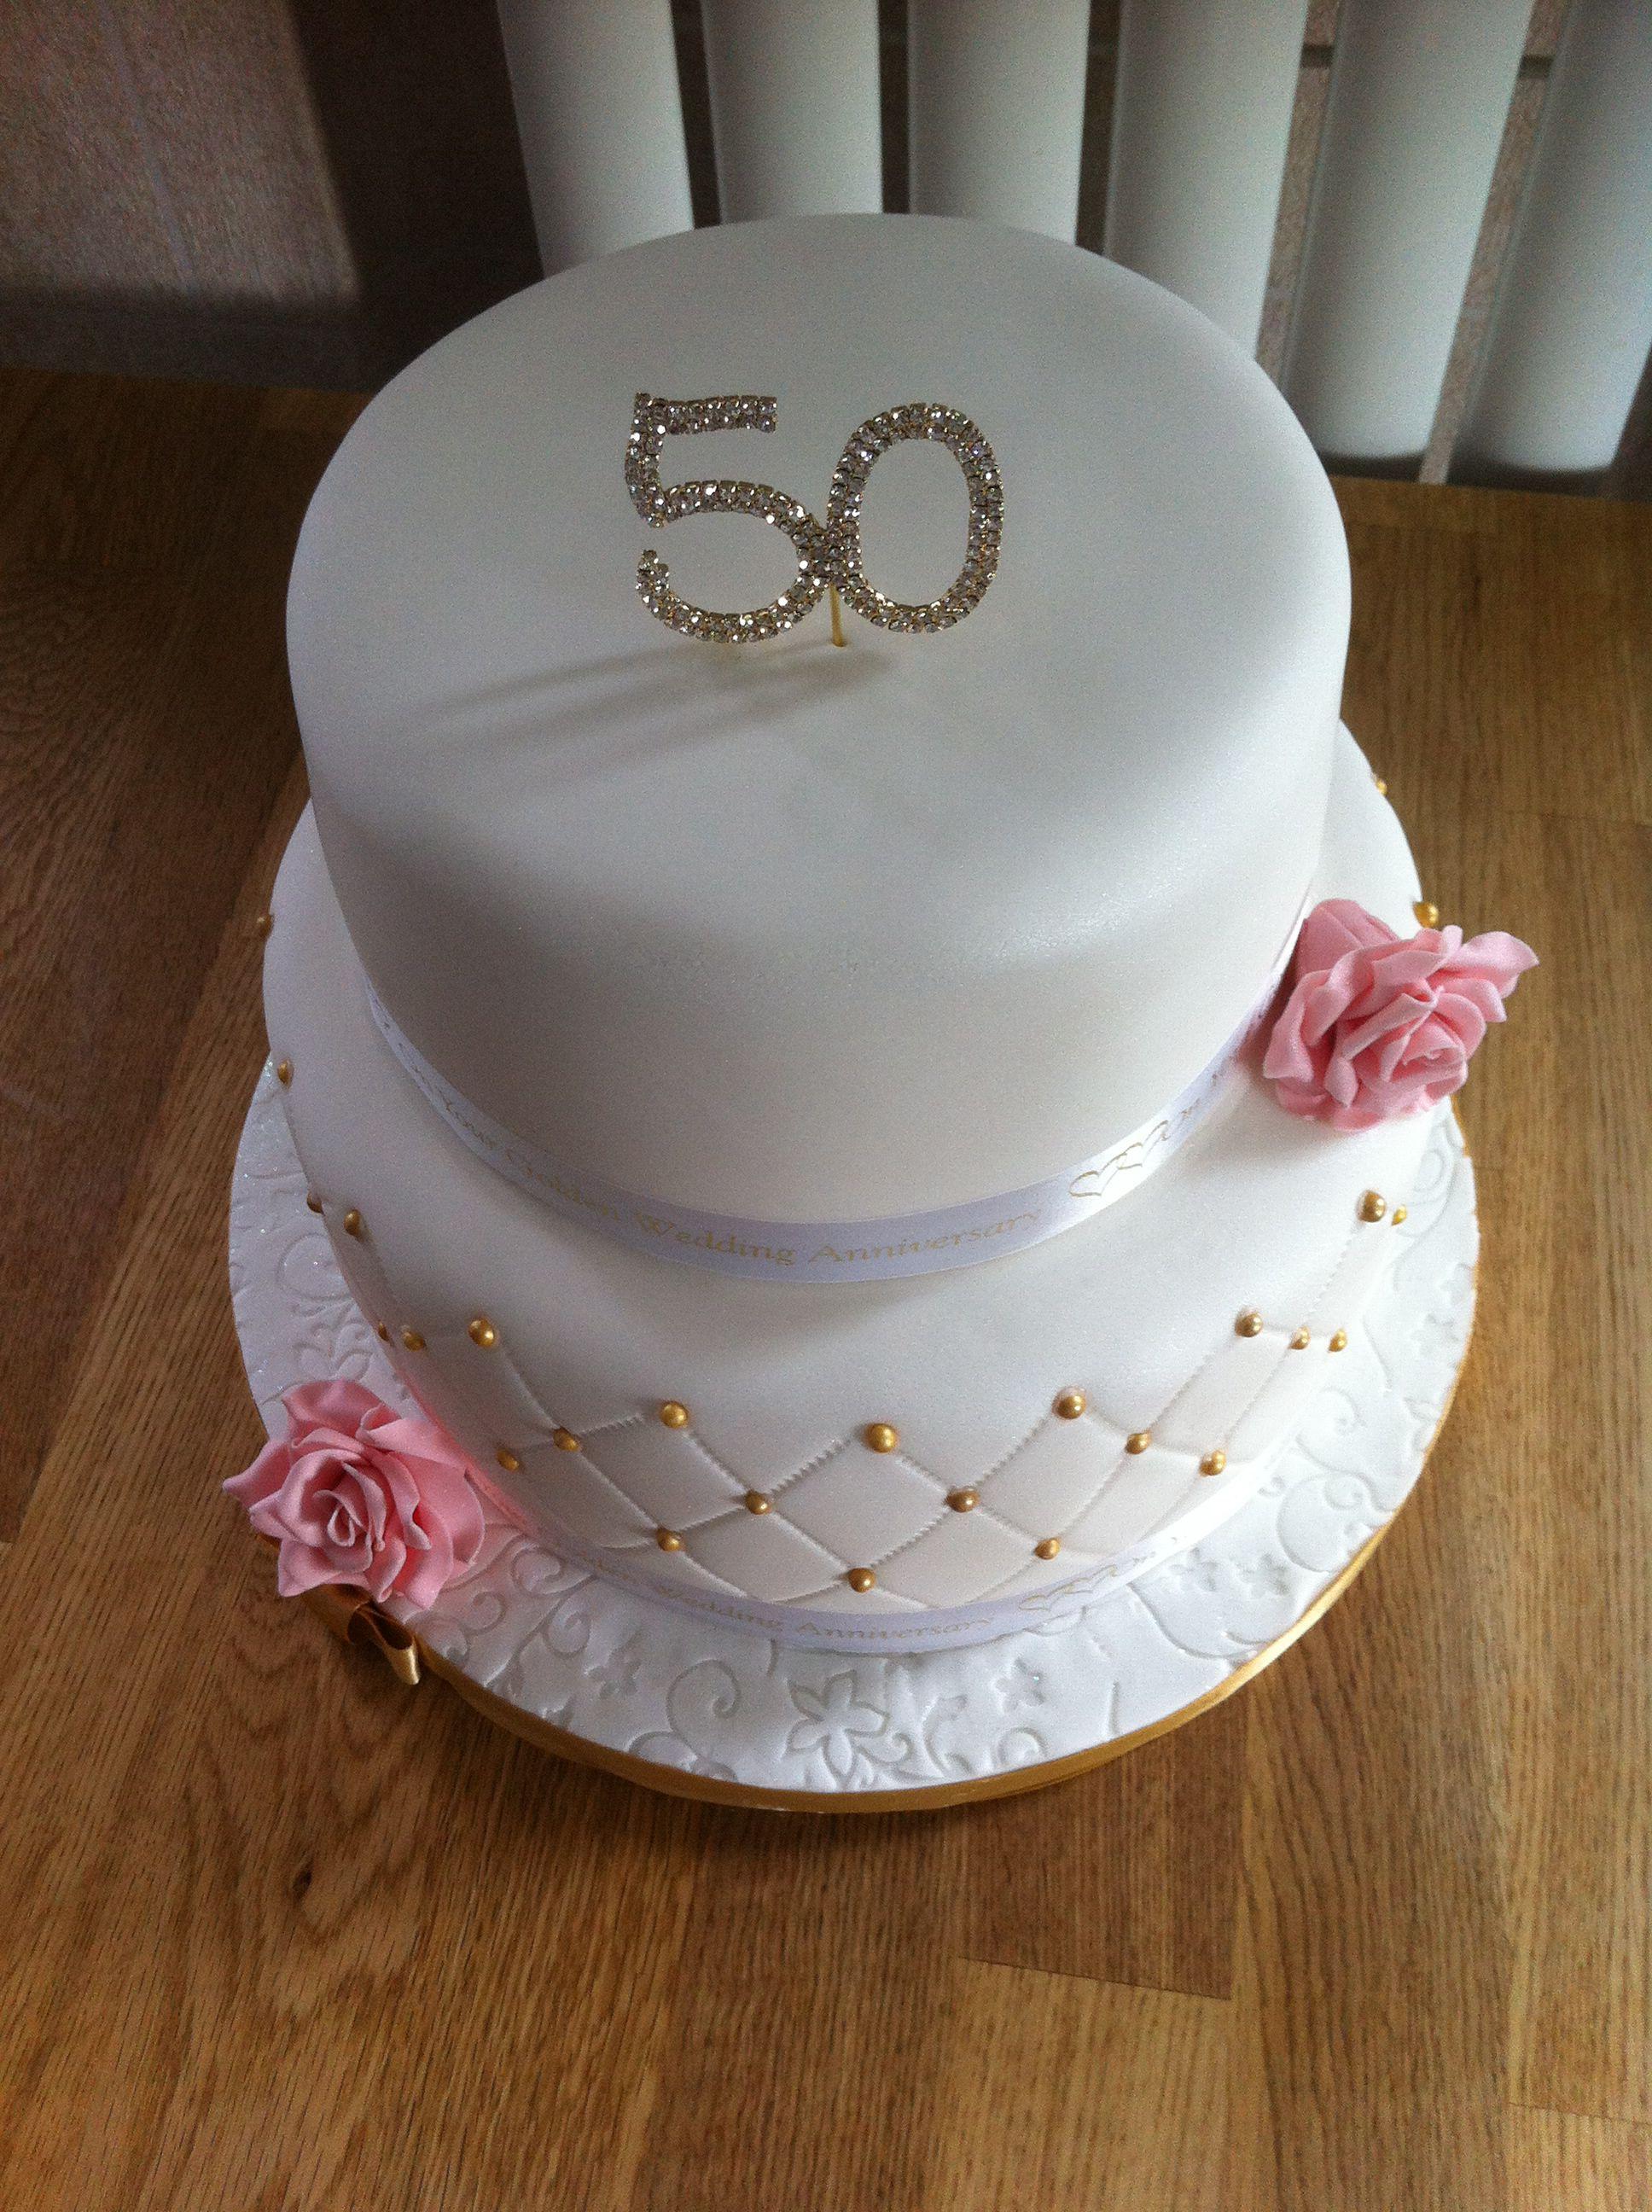 Th golden wedding anniversary cake food u drink that i love